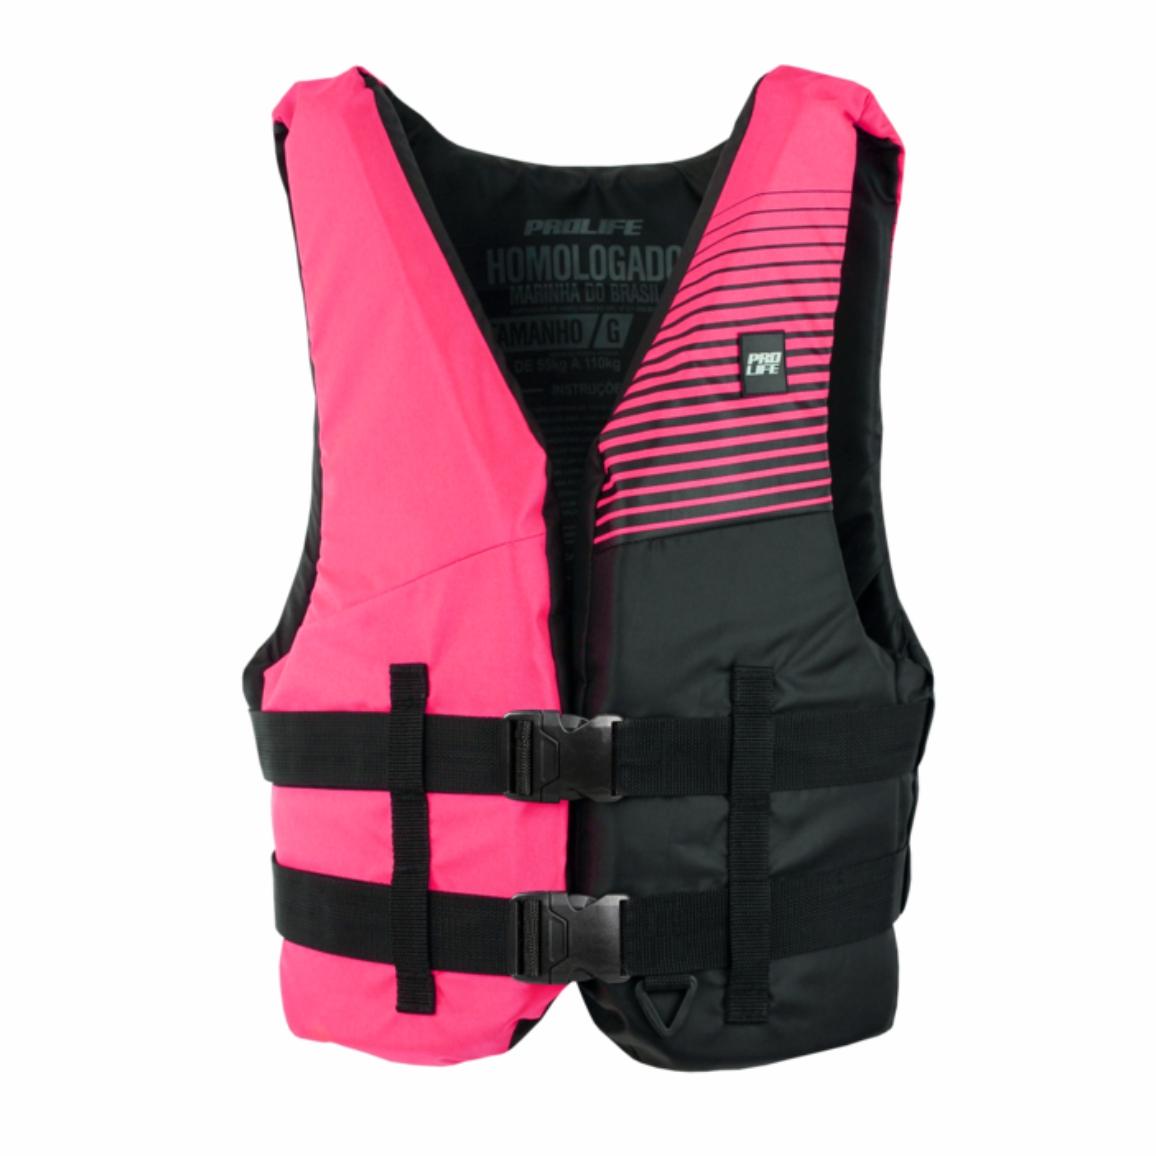 Colete Salva Vidas ProLife N1 Homologado Classe 5 Rosa  - Pesca Adventure